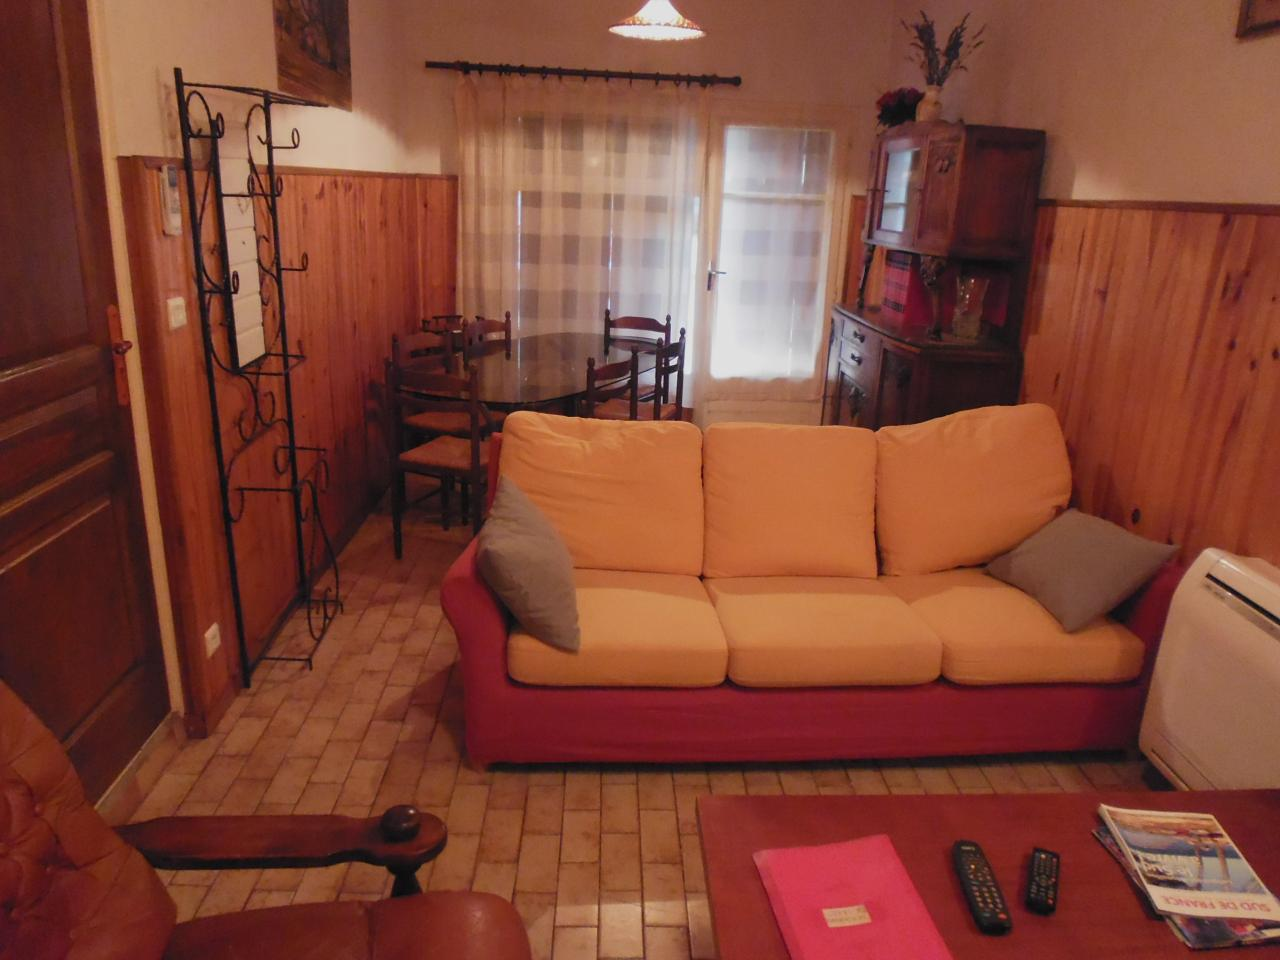 Salon, salle à manger du gîte le romarin Lezan Gard